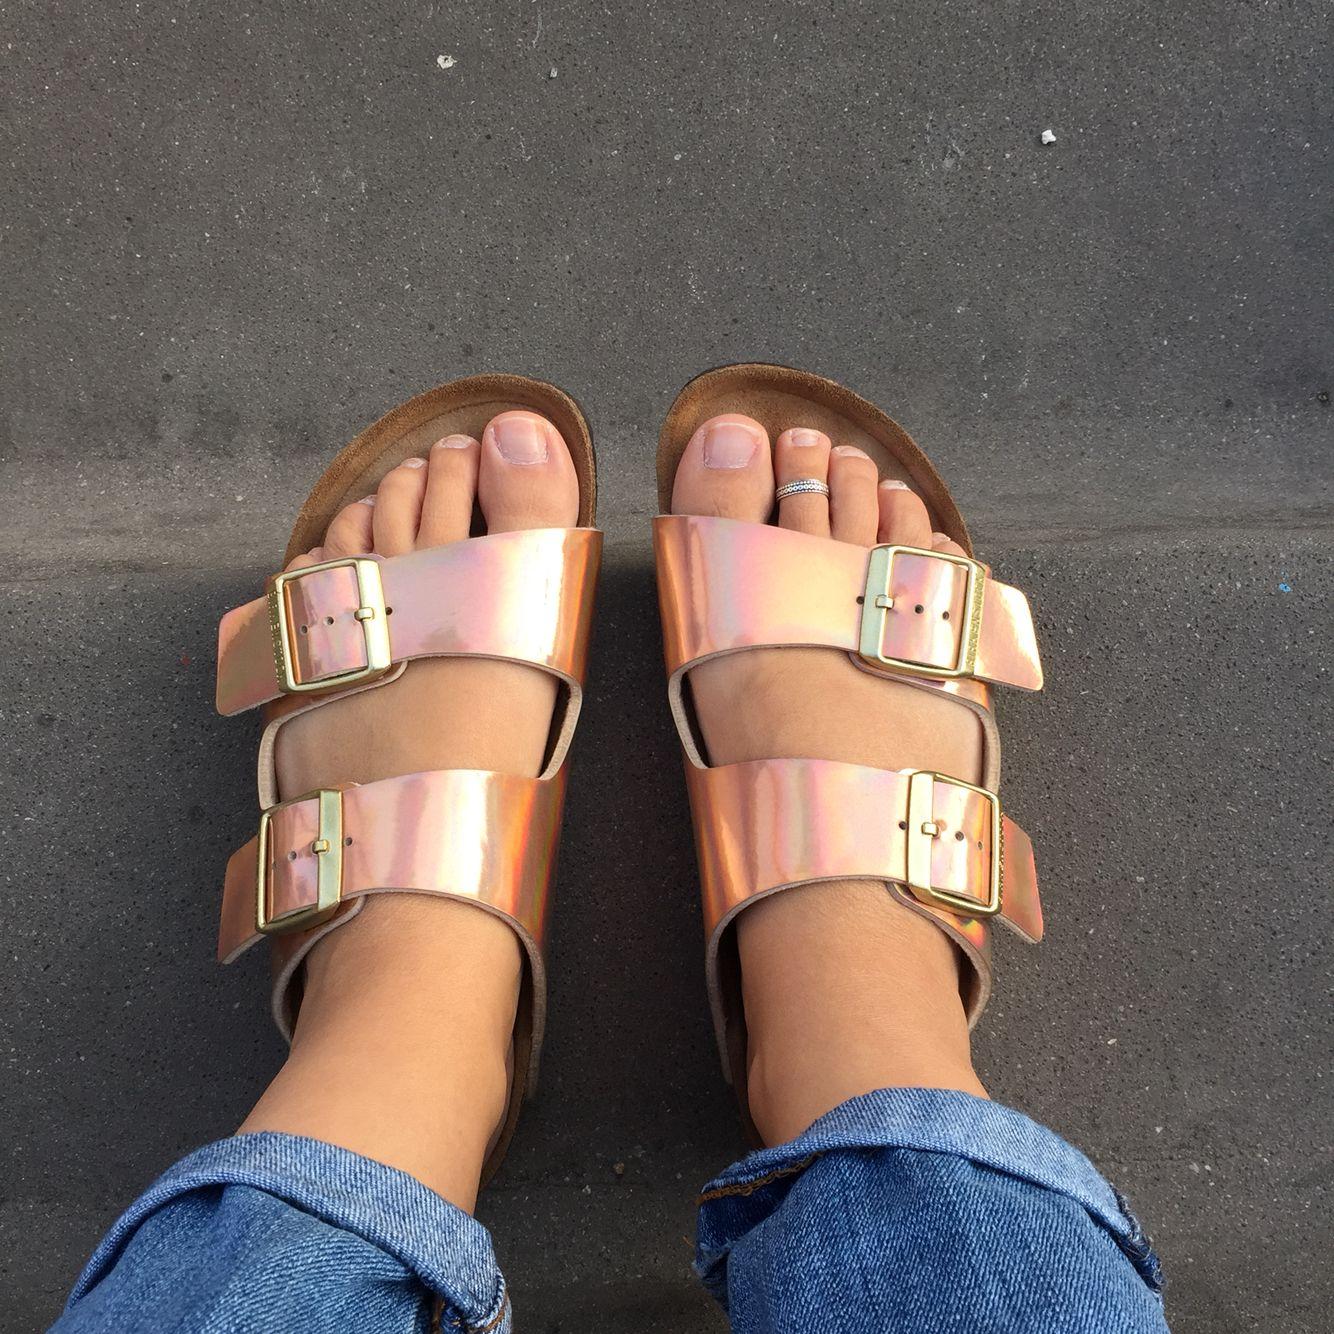 Copper birkenstocks trend style | Heel sandals outfit